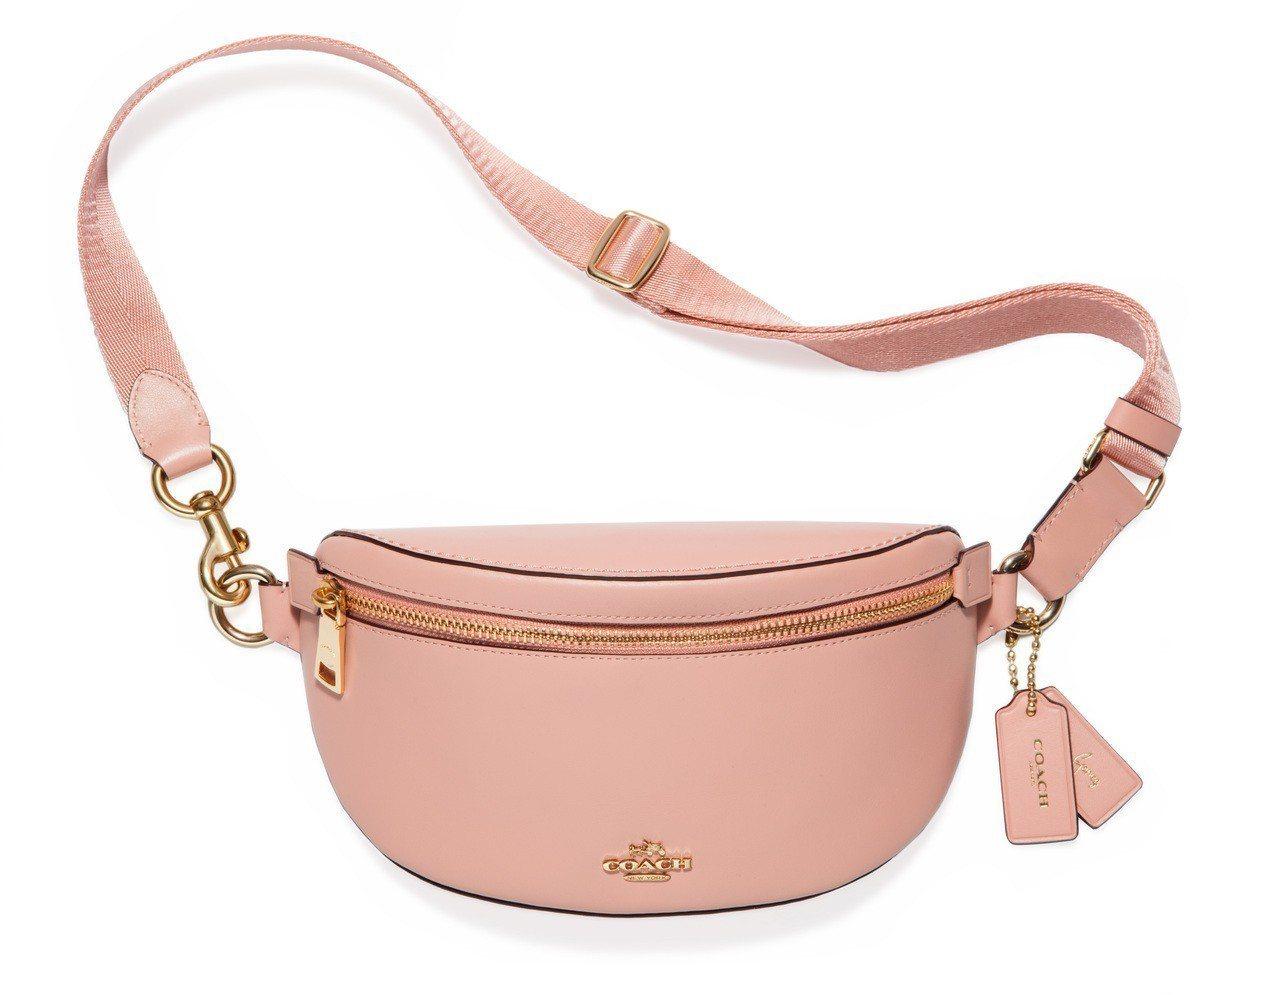 COACH x Selena Gomez系列粉紅色腰包,售價9,900元。圖/C...